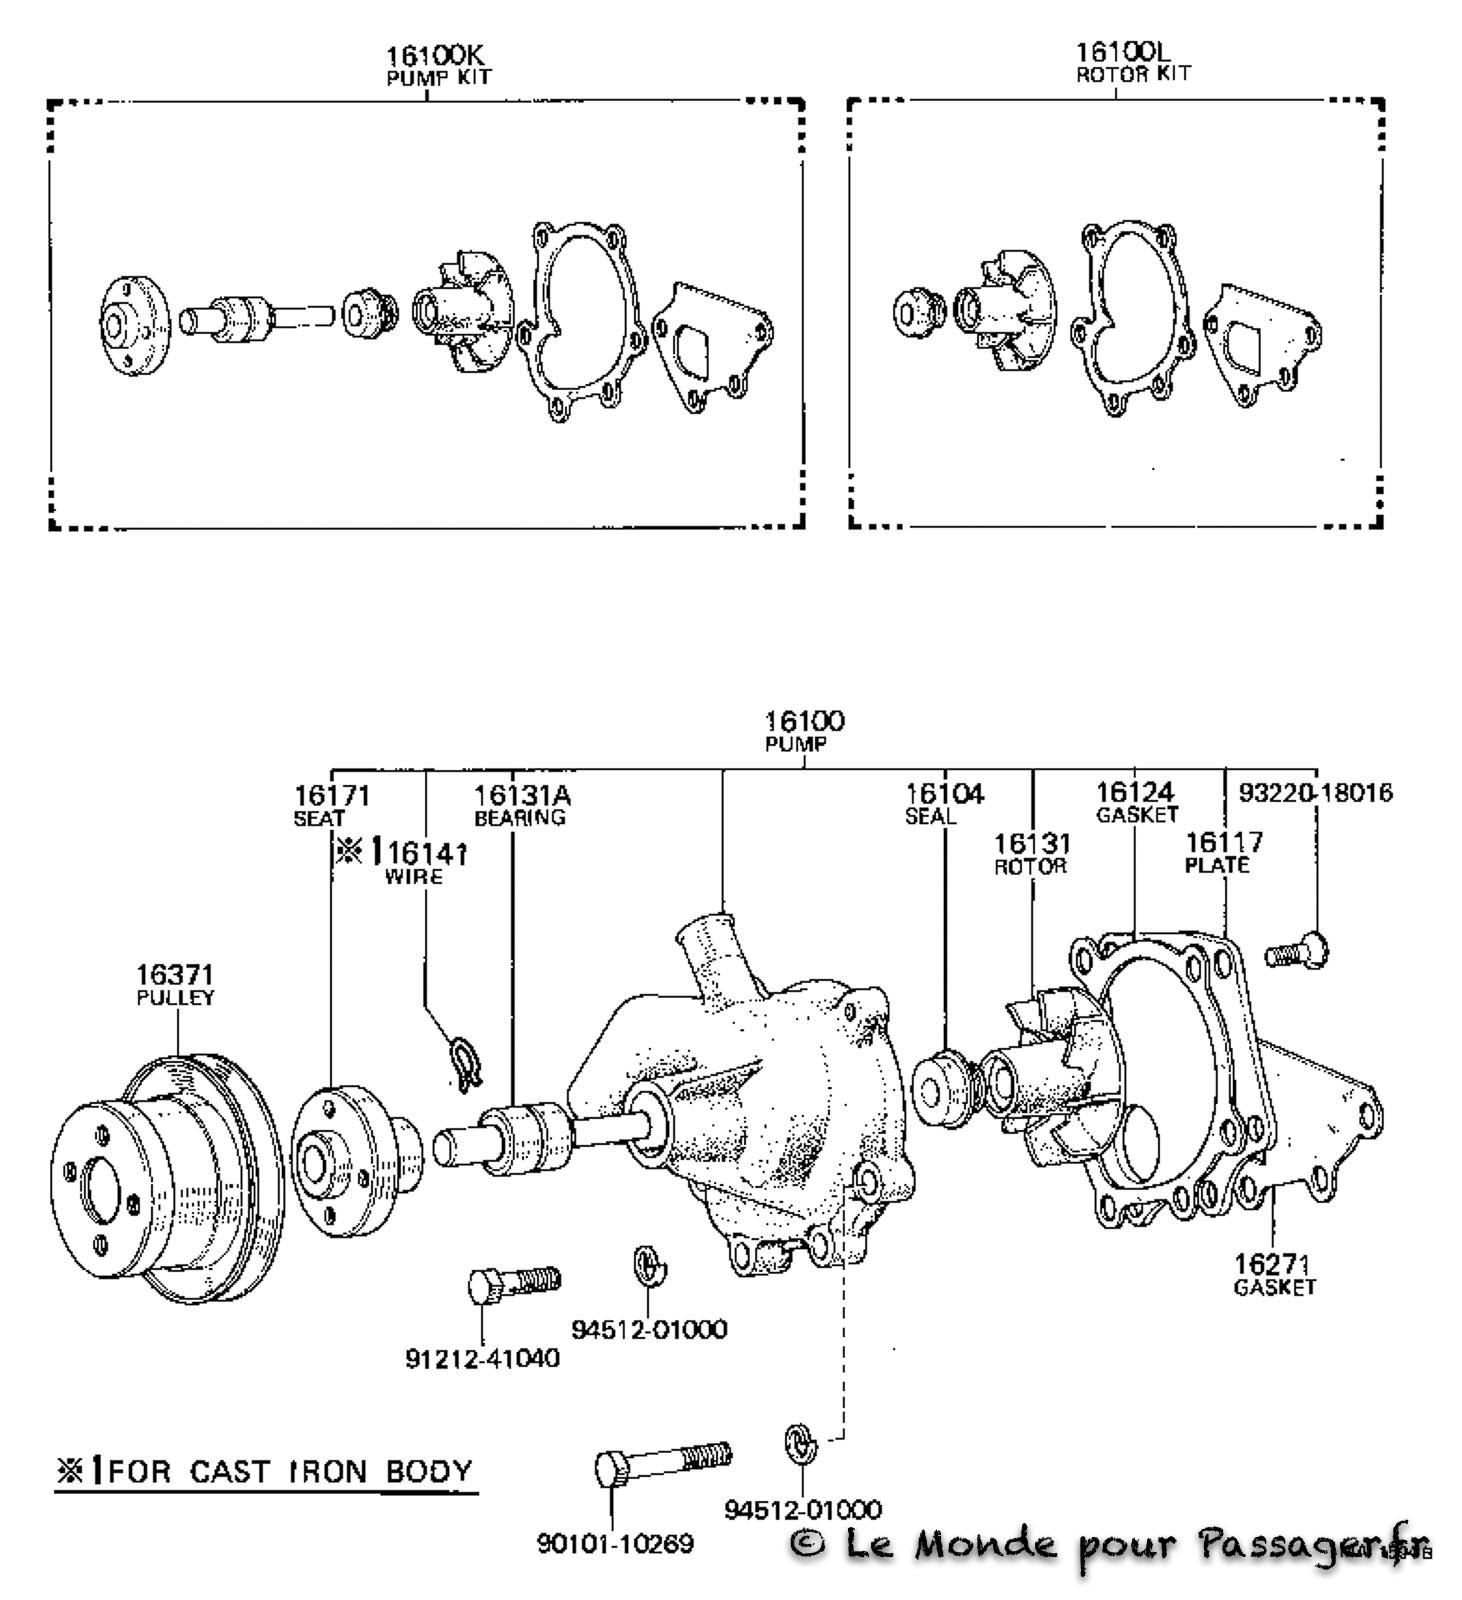 Fj55-Eclatés-Techniques015